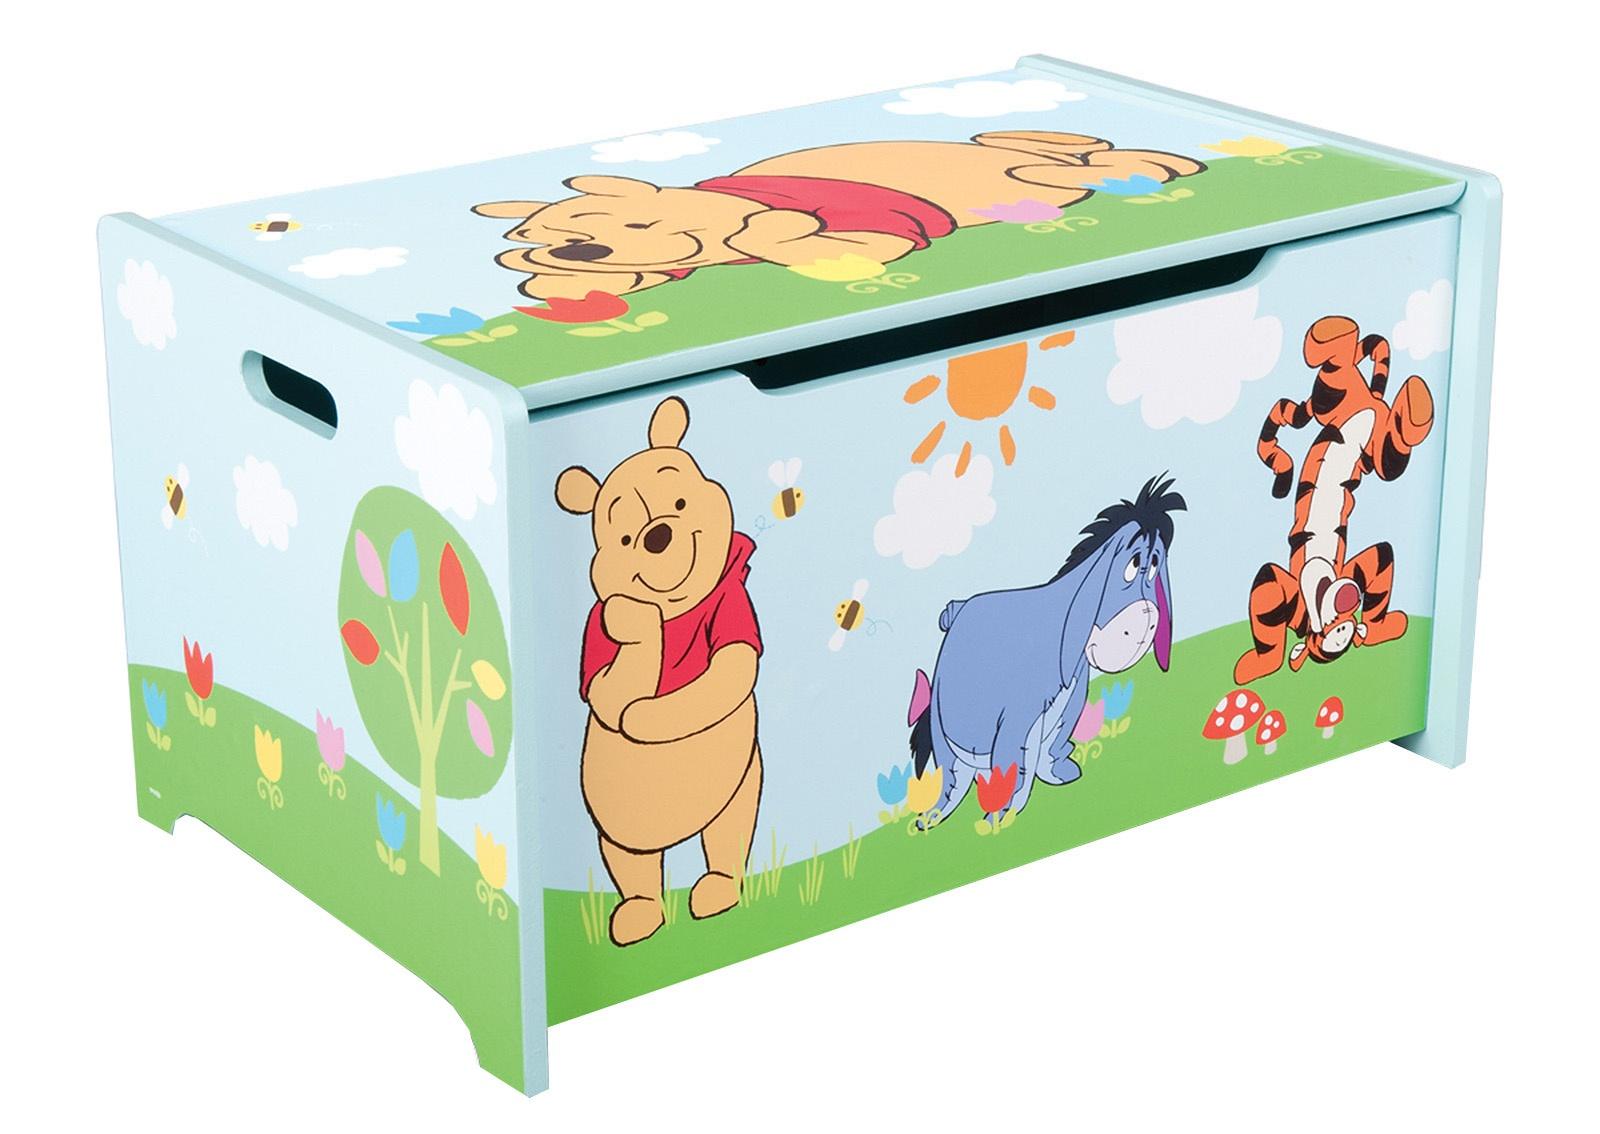 Disney Winnie the Pooh Toy Box 60 x 36 x 39 cm blue - Internet-Toys